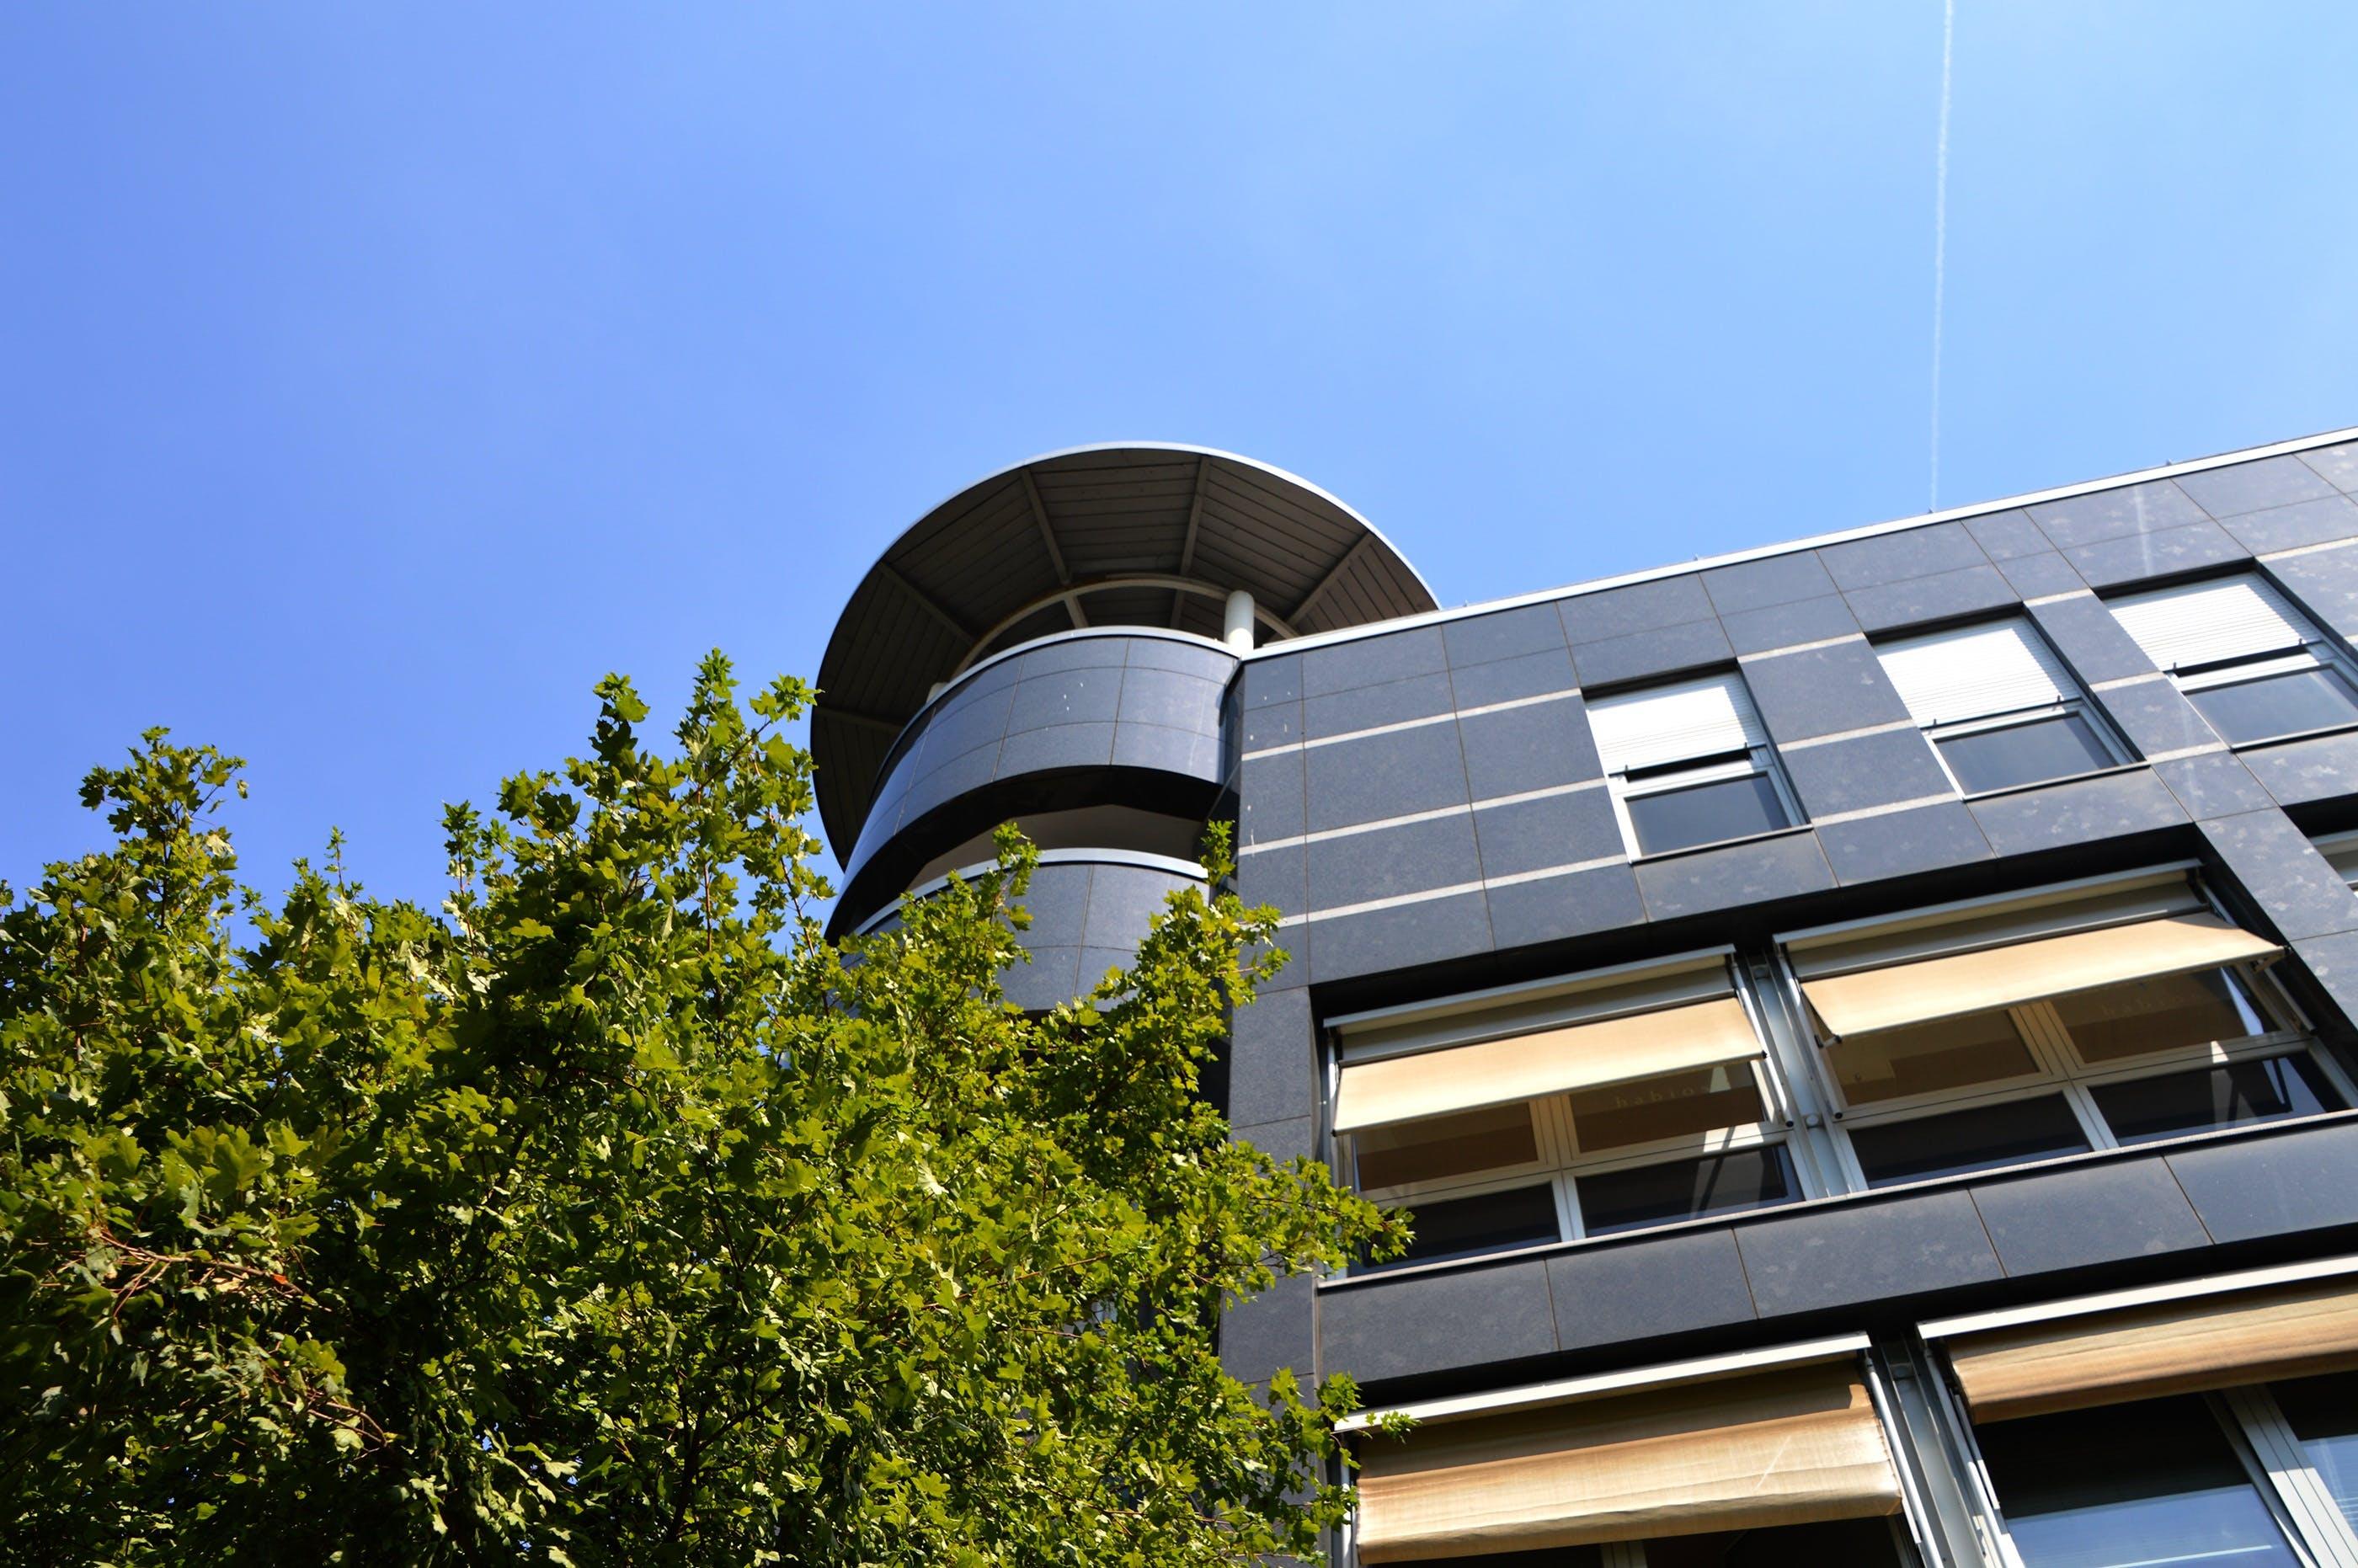 Free stock photo of architecture, building, design, facade